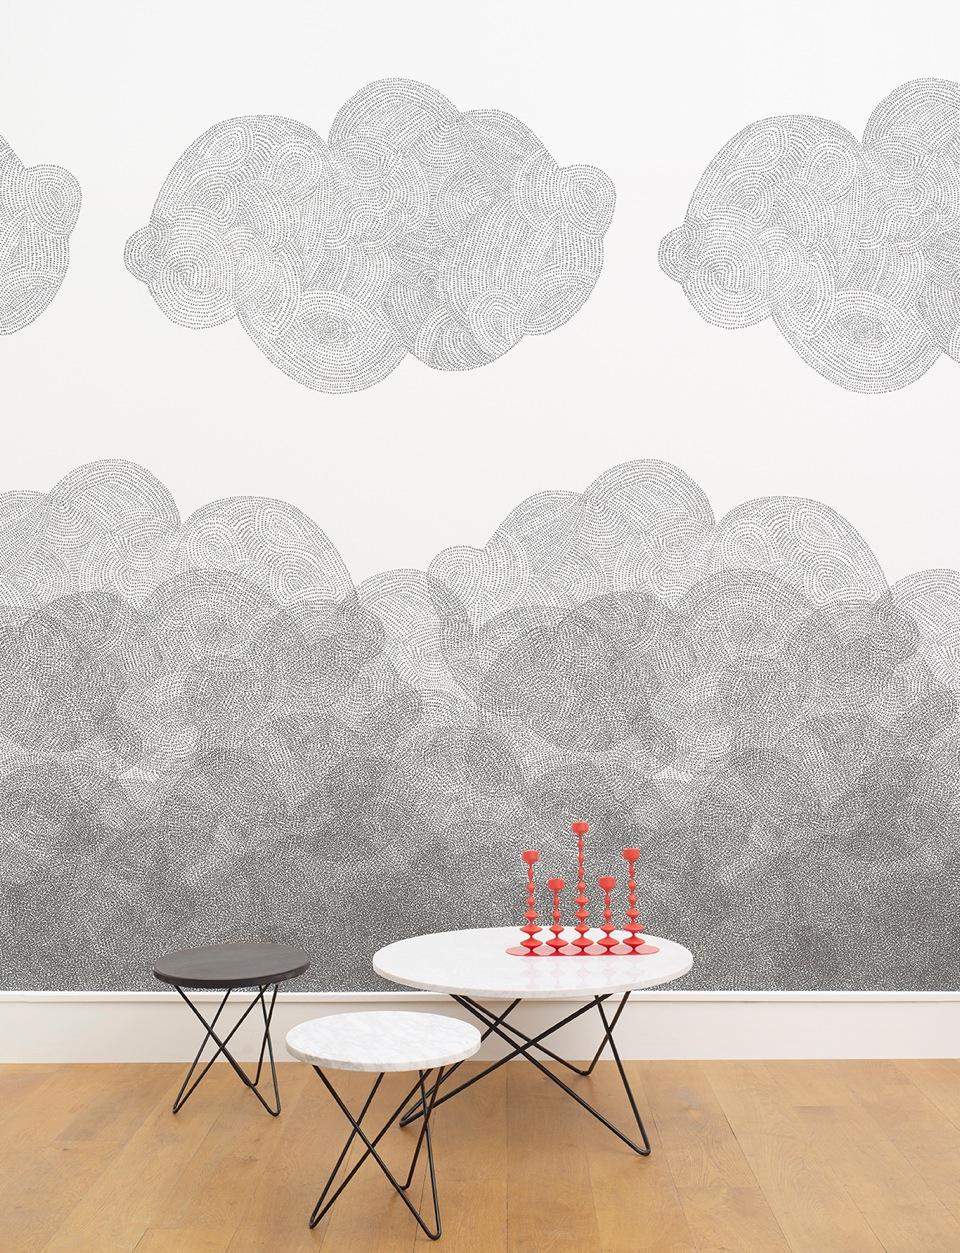 CLOUDS-by-MINAKANILAB-www-minakanilab-com-Retailer-Maison-M-Paris-maisonM-minakani-wallpaper-wp5205301